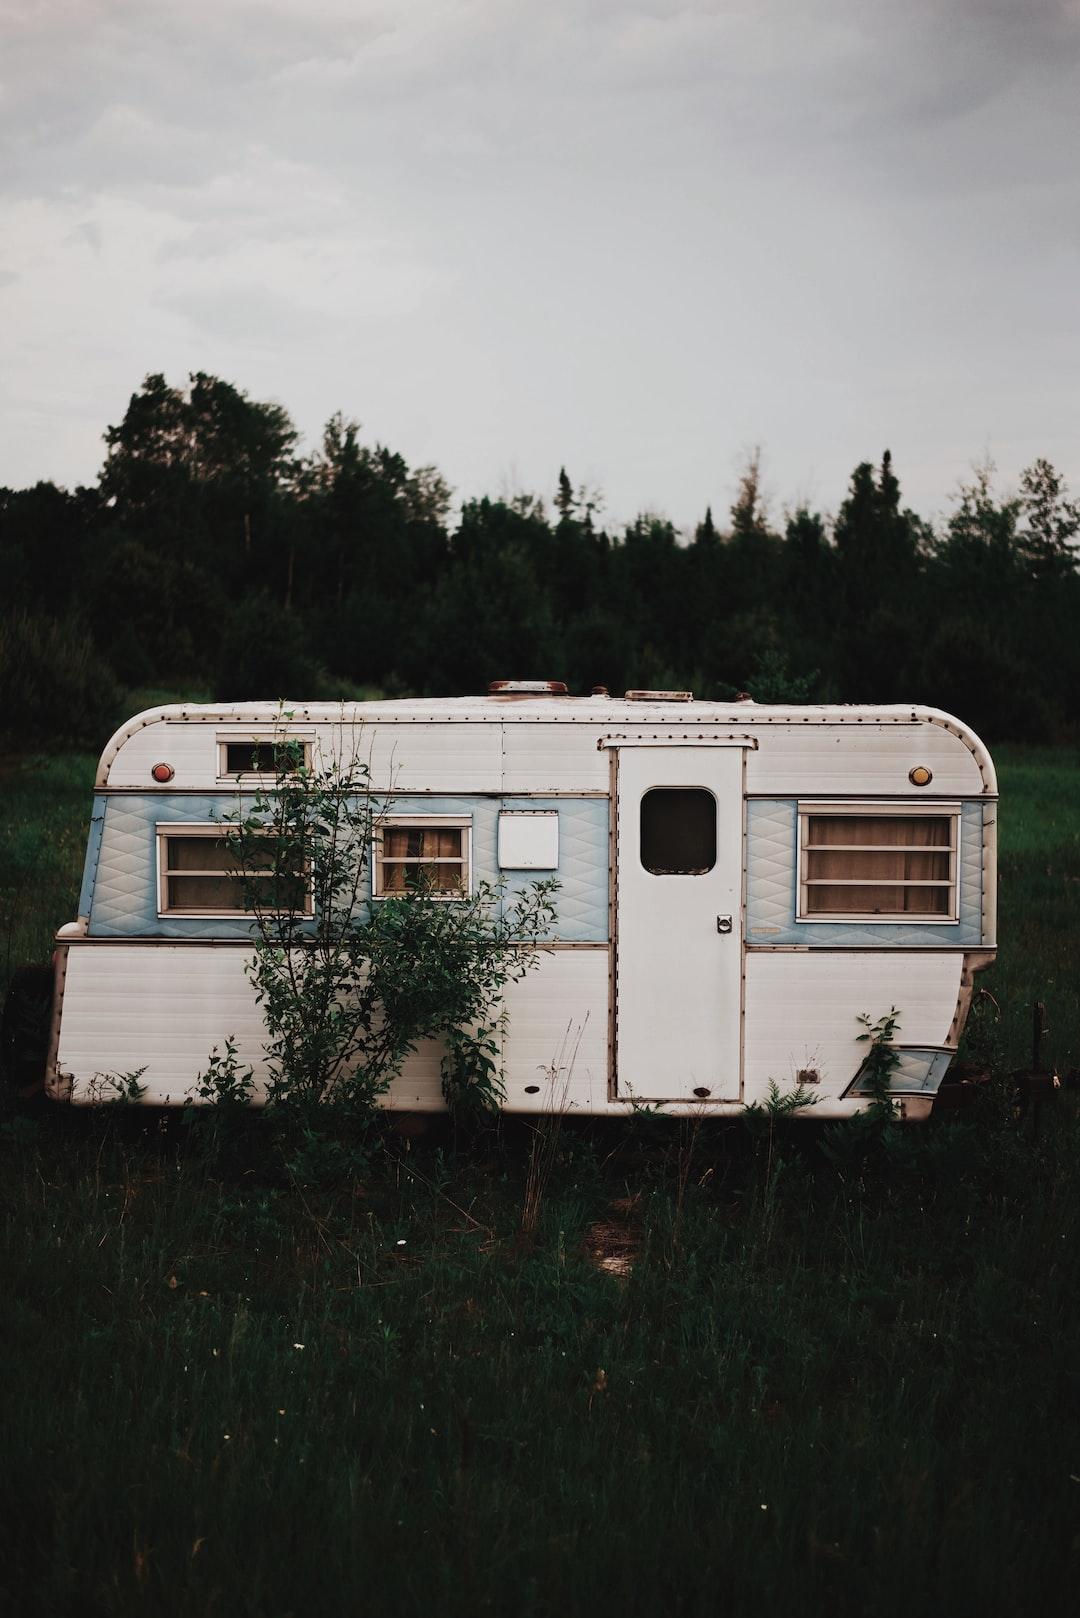 Caravan in a meadow